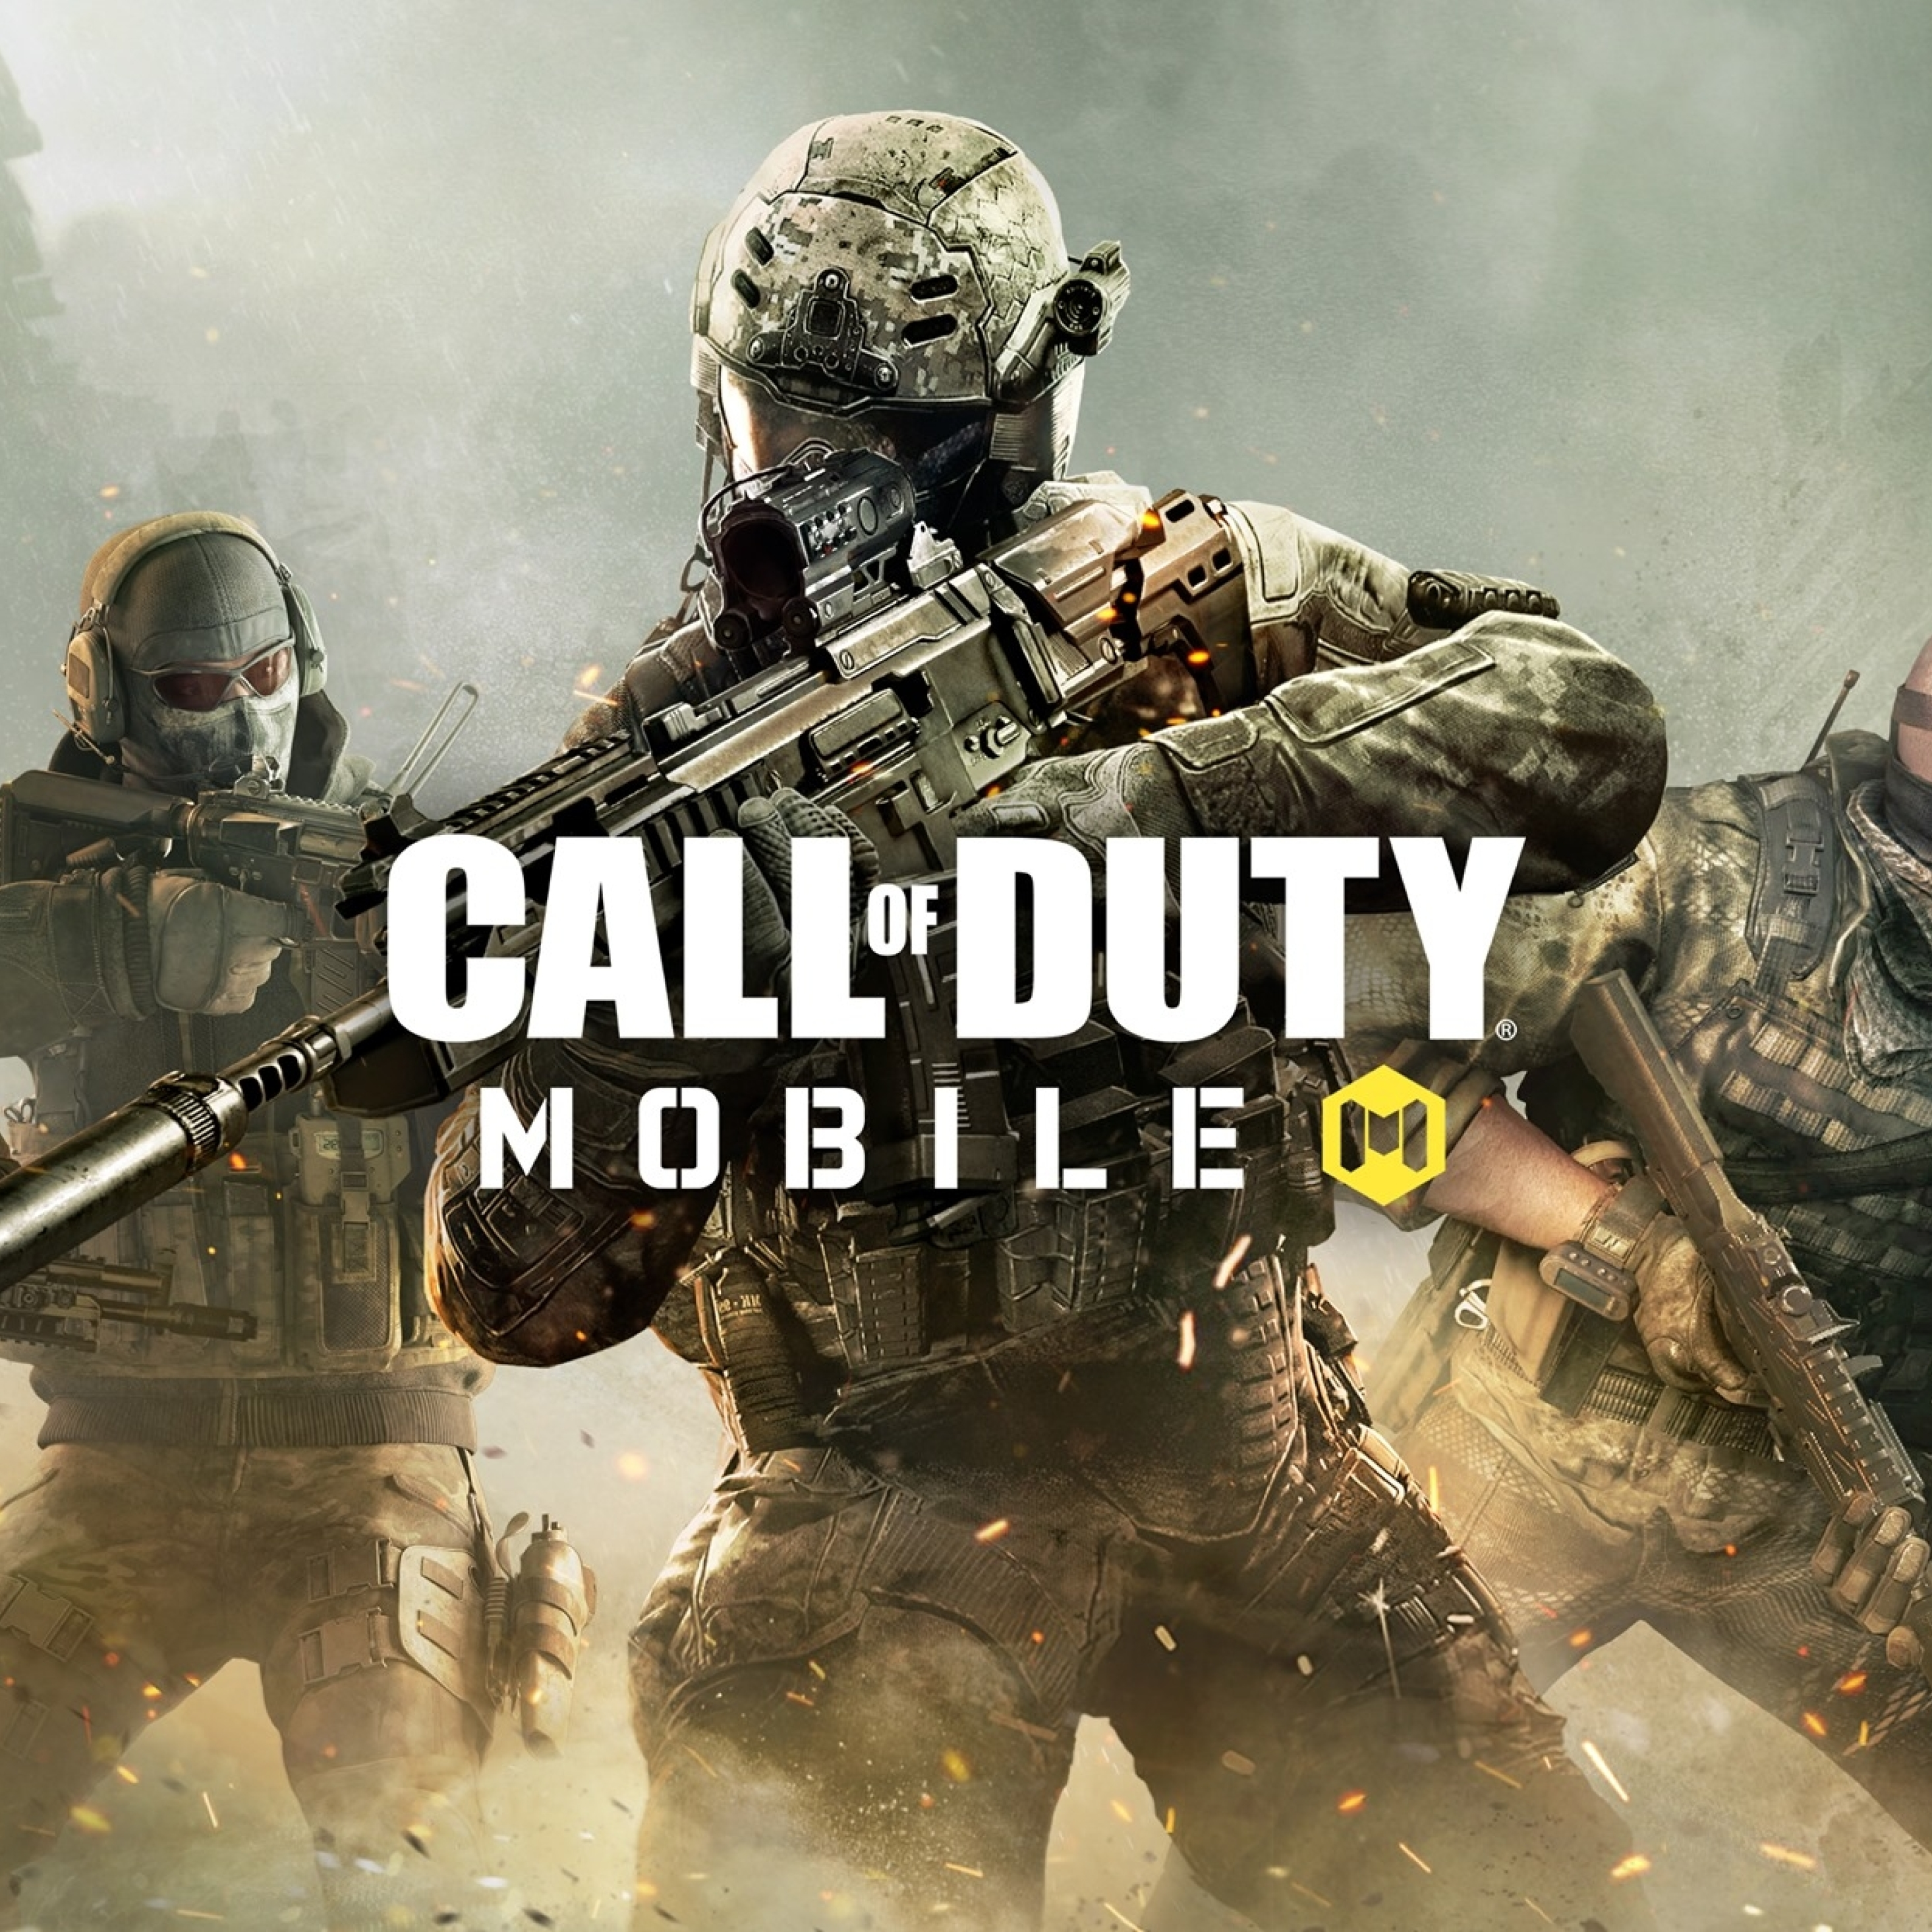 2932x2932 Call Of Duty Mobile Game Ipad Pro Retina Display 2932x2932